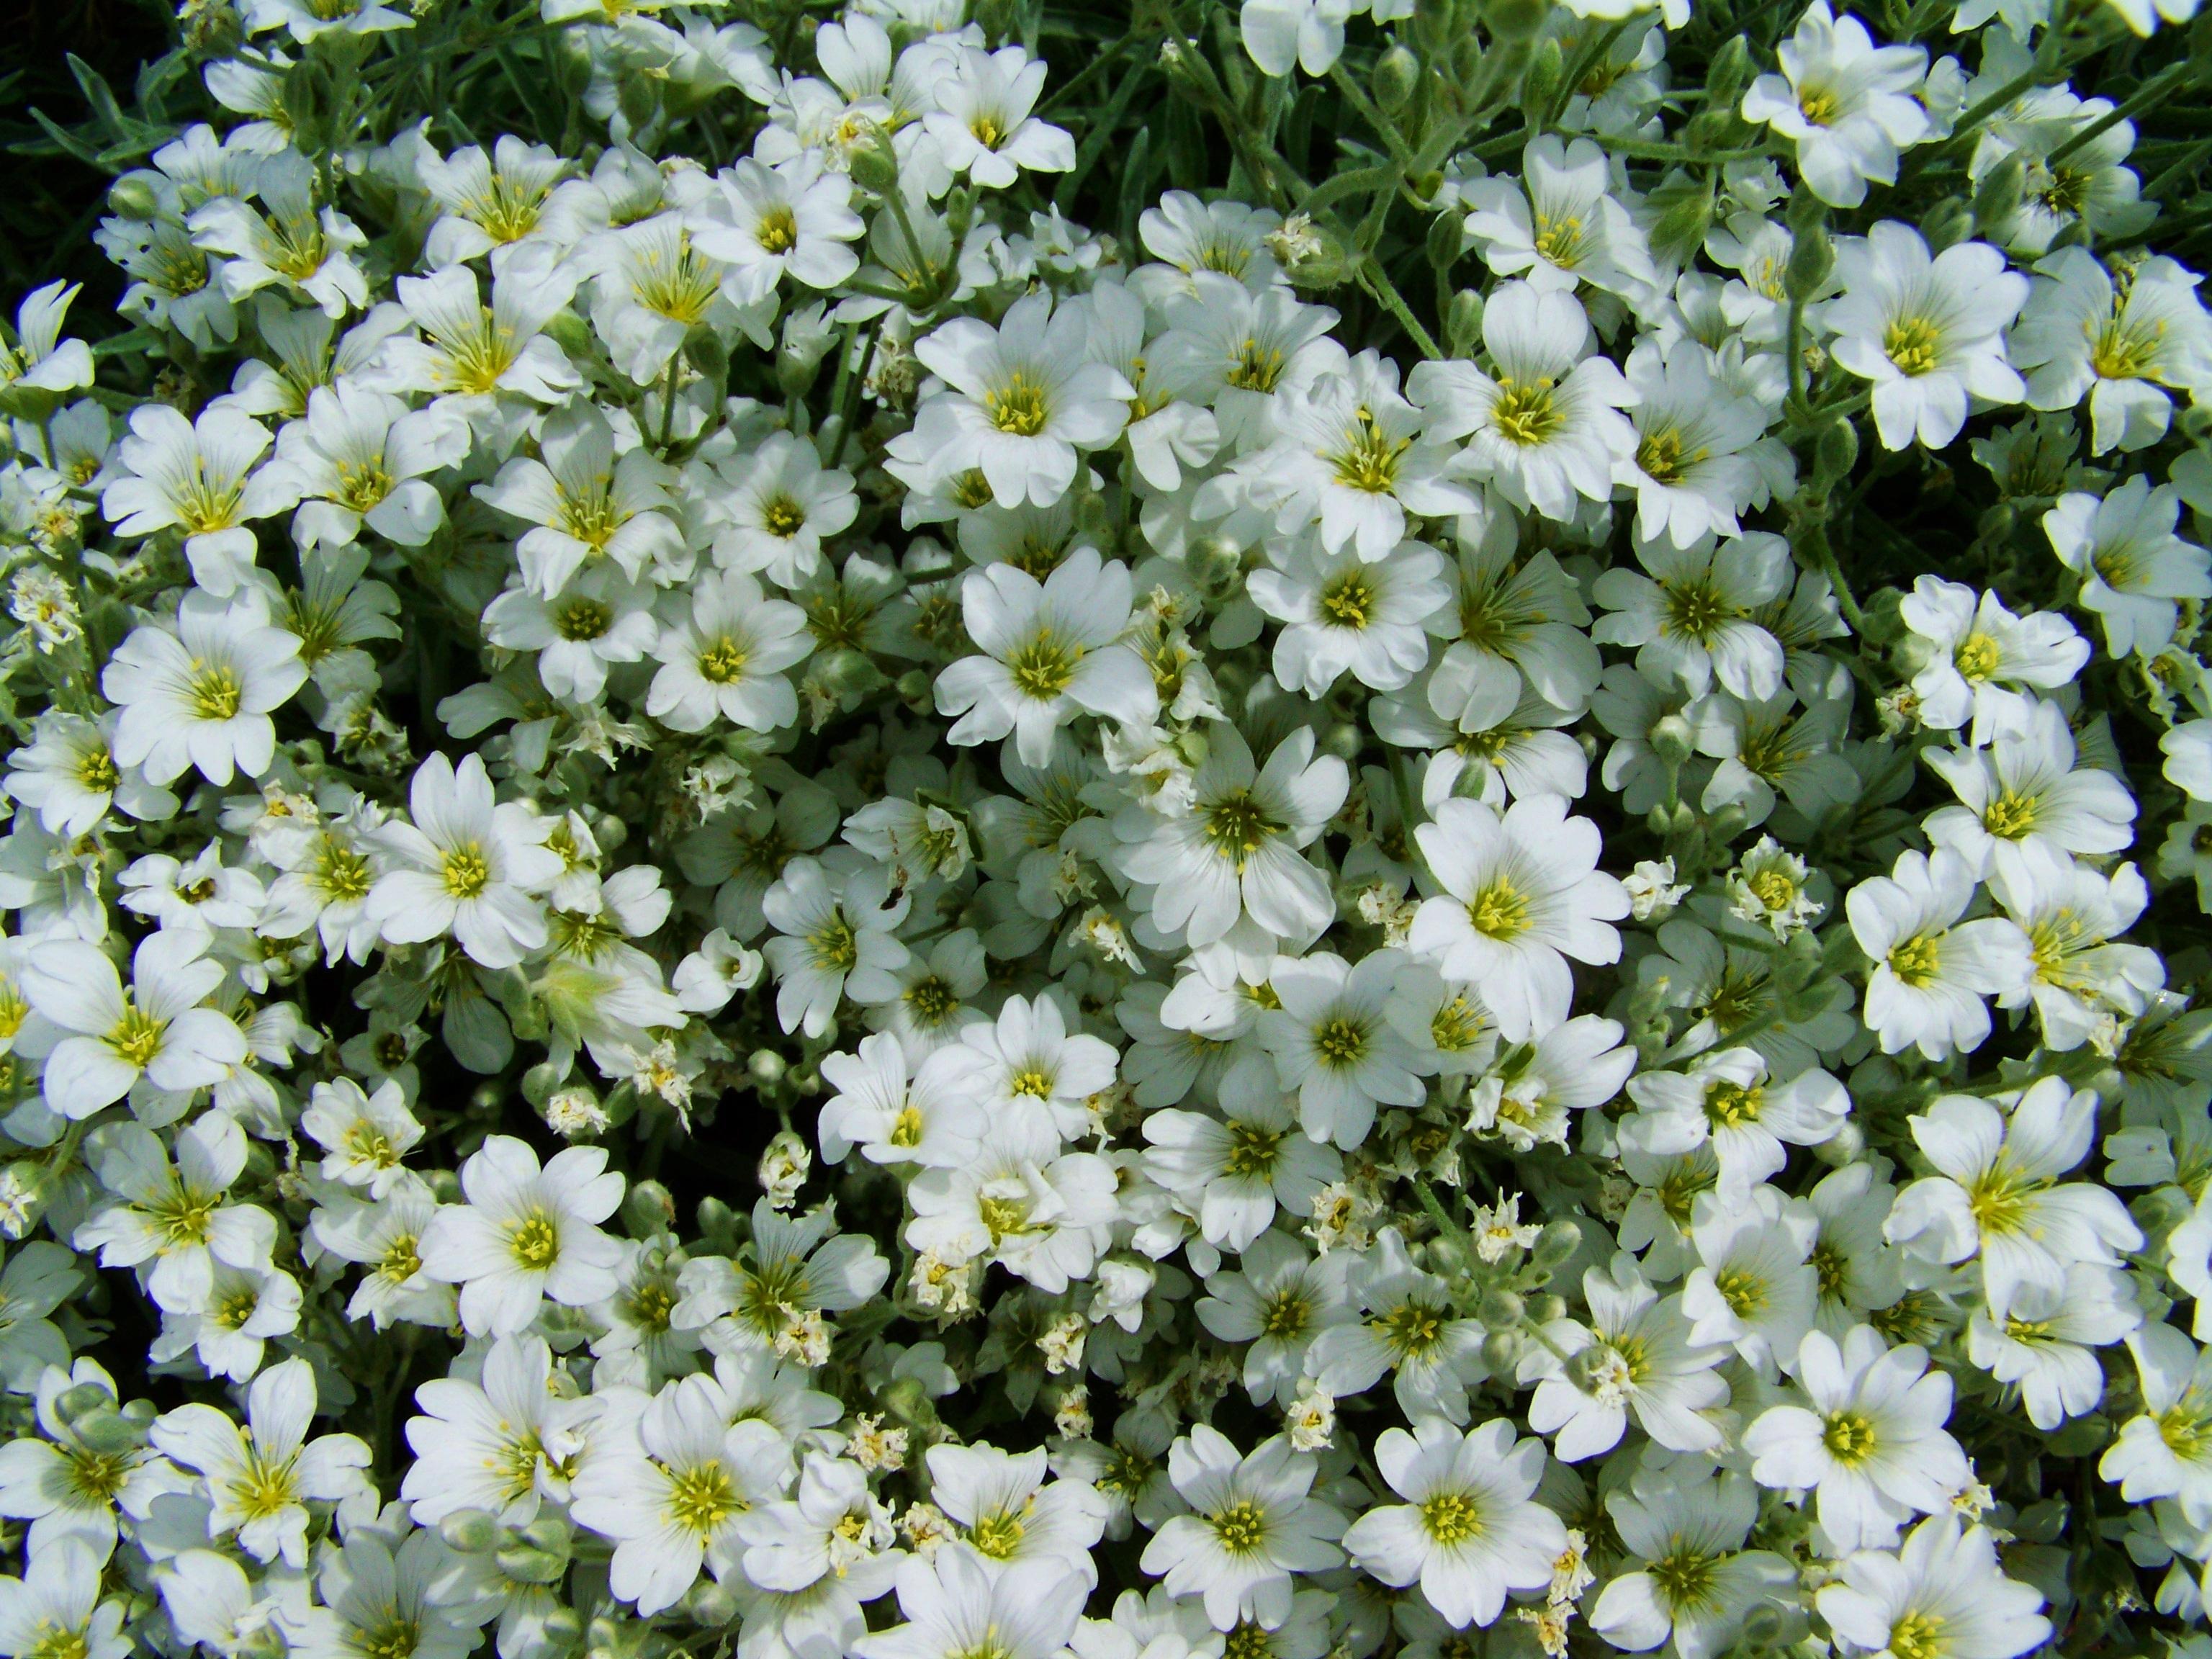 Free Images Blossom Botany Flora Wildflower Shrub Flower